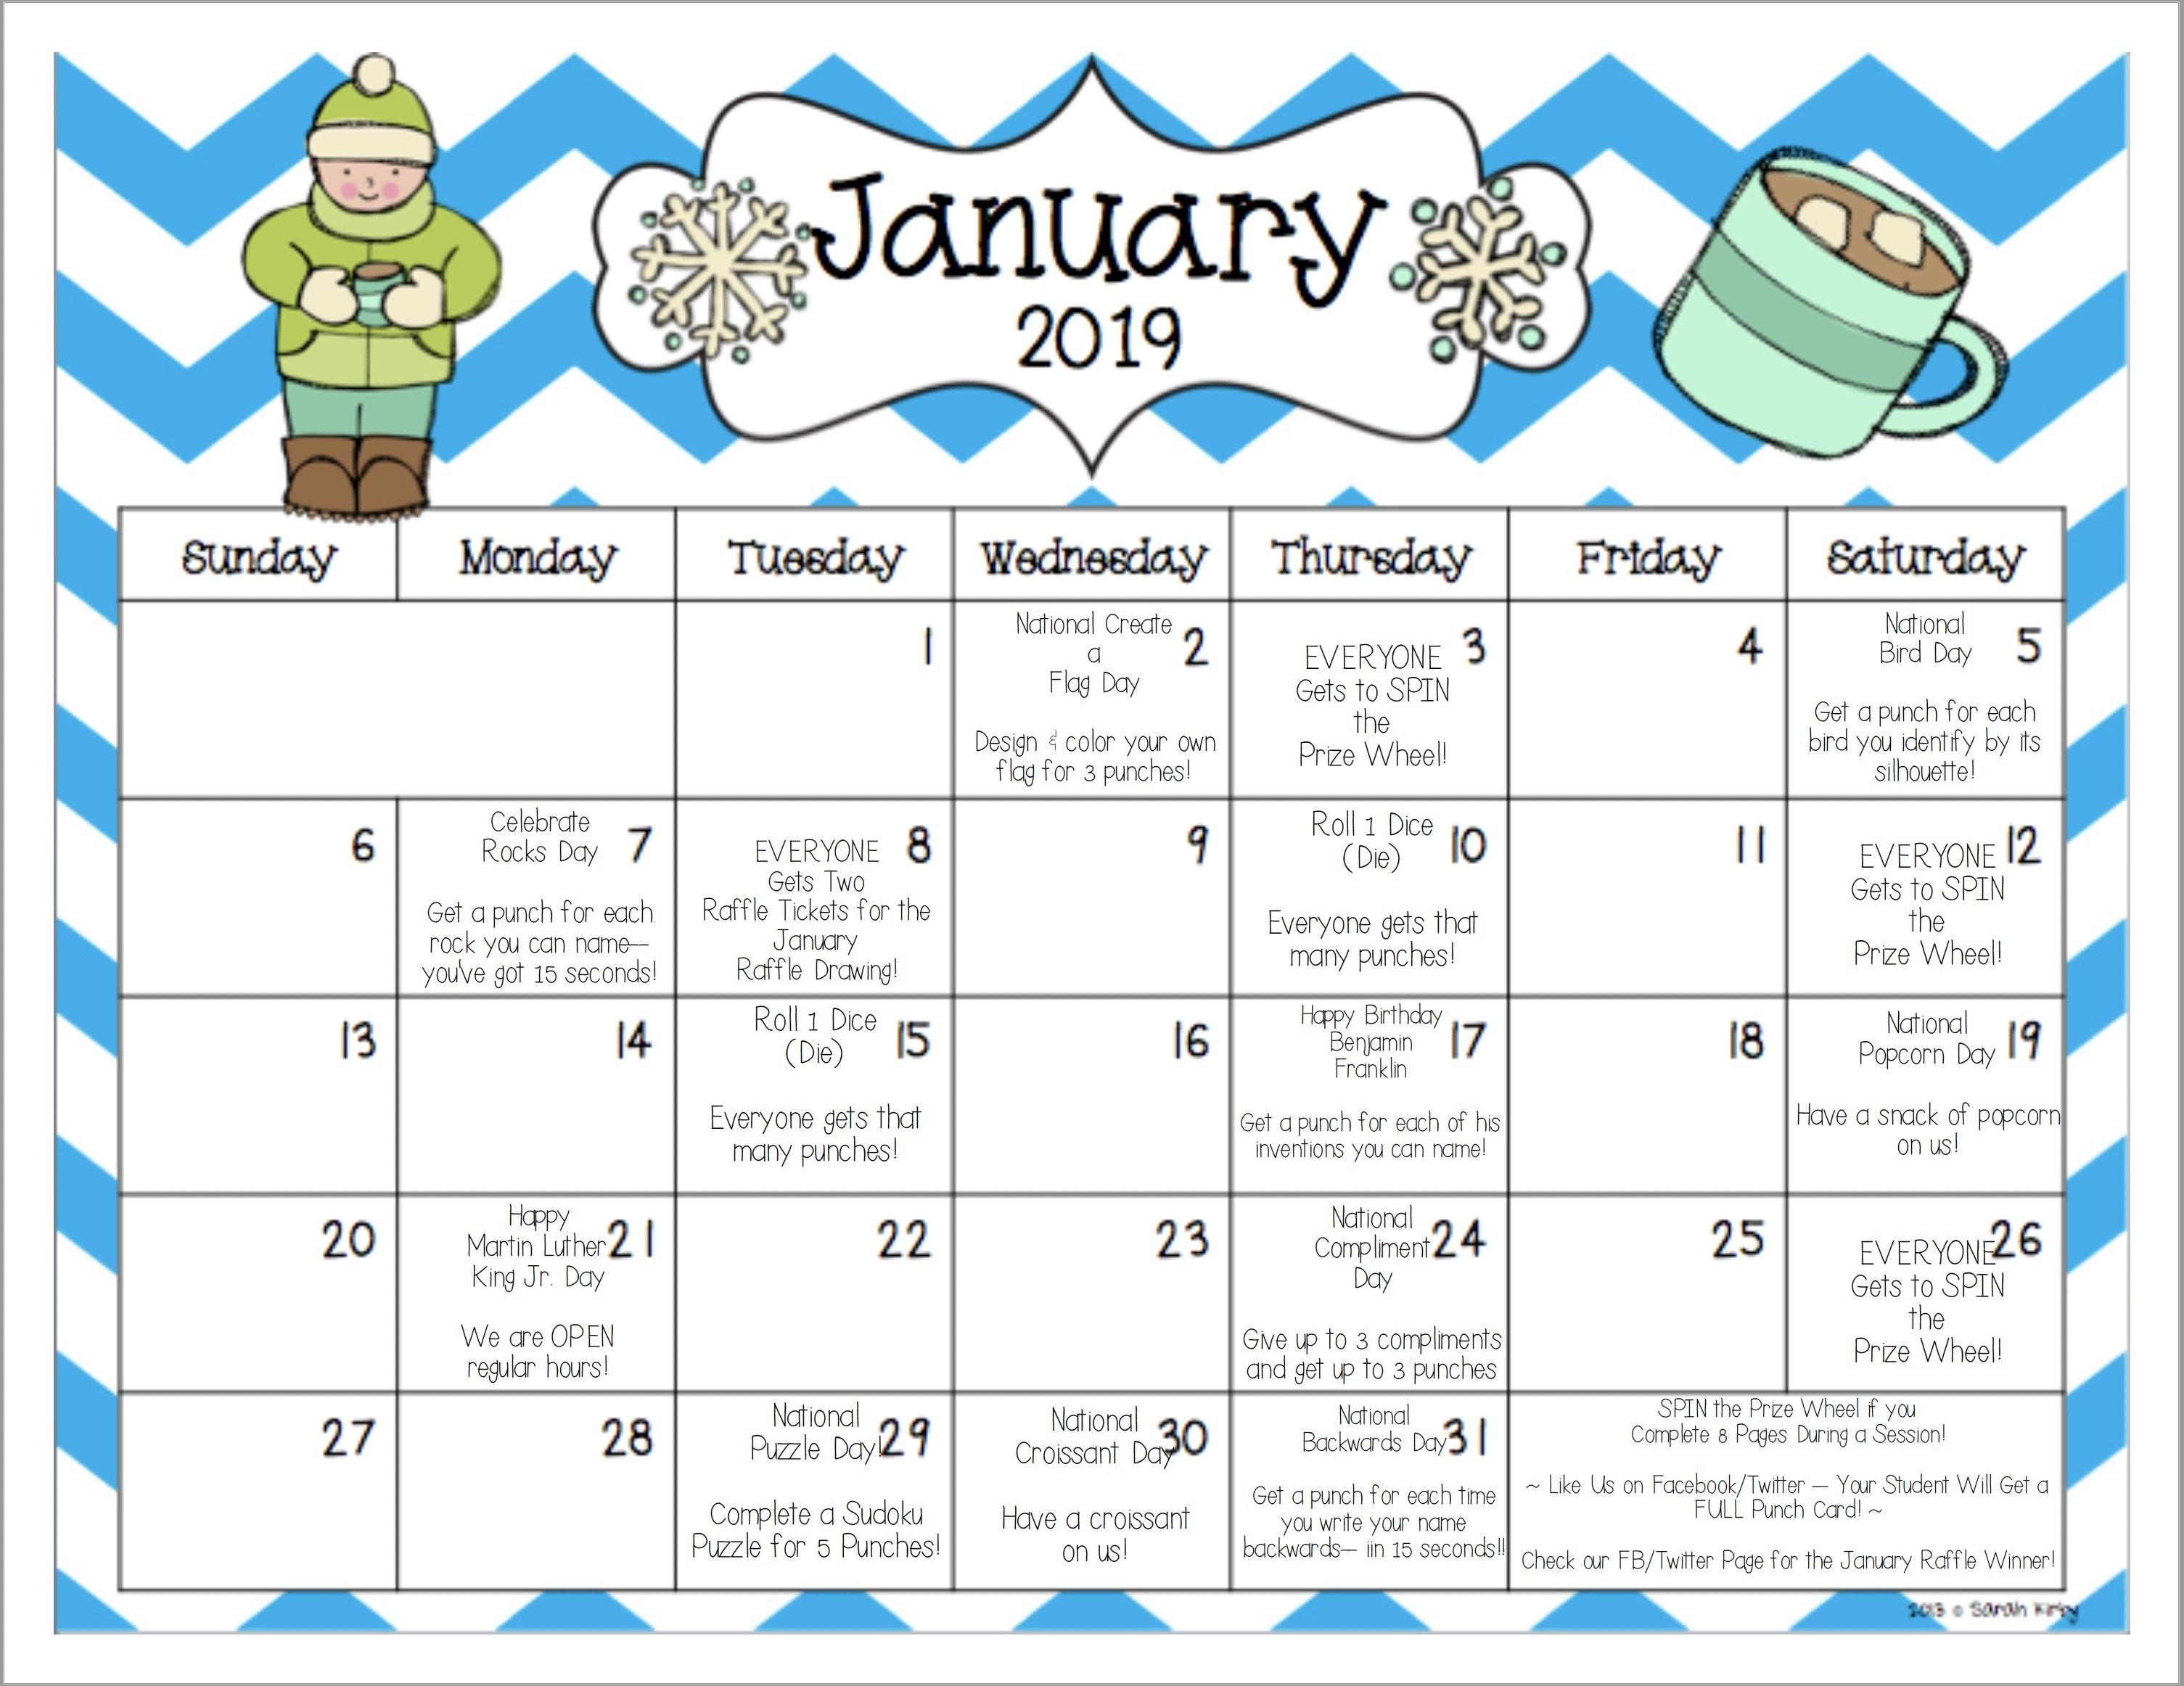 Www.mathnasium/january 2019 Fun Calendar   Mathnasium Rock N Roll Calendar 2019